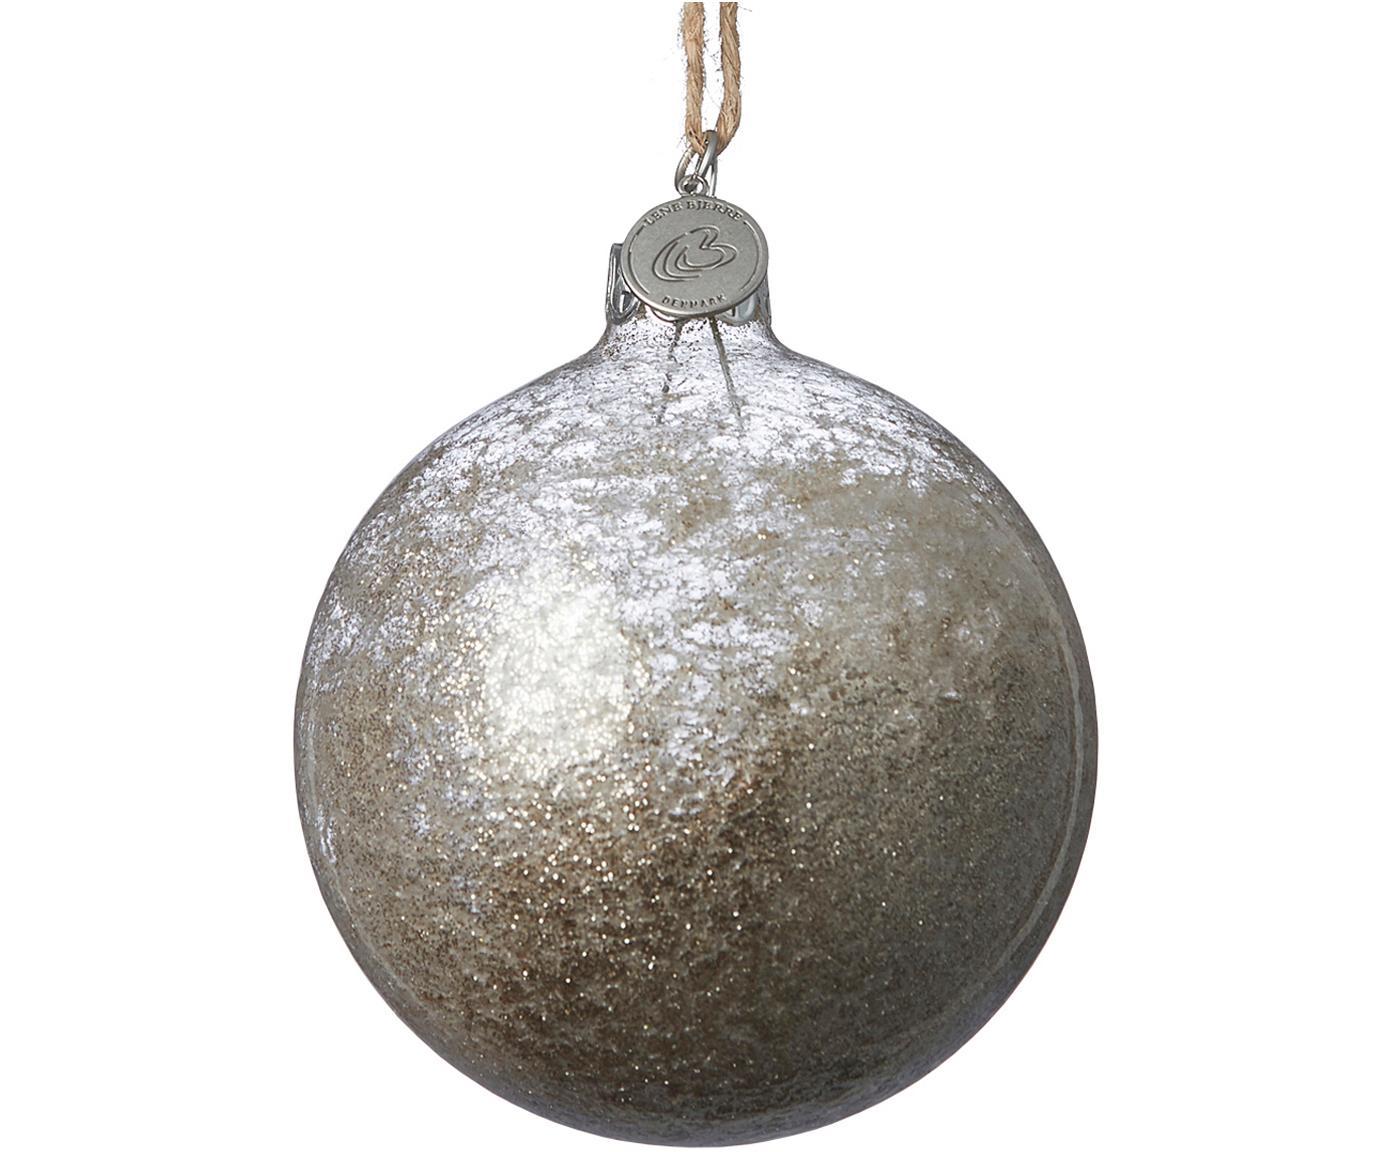 Kerstballen Velma, 2 stuks, Goudkleurig, transparant, Ø 8 x H 8 cm